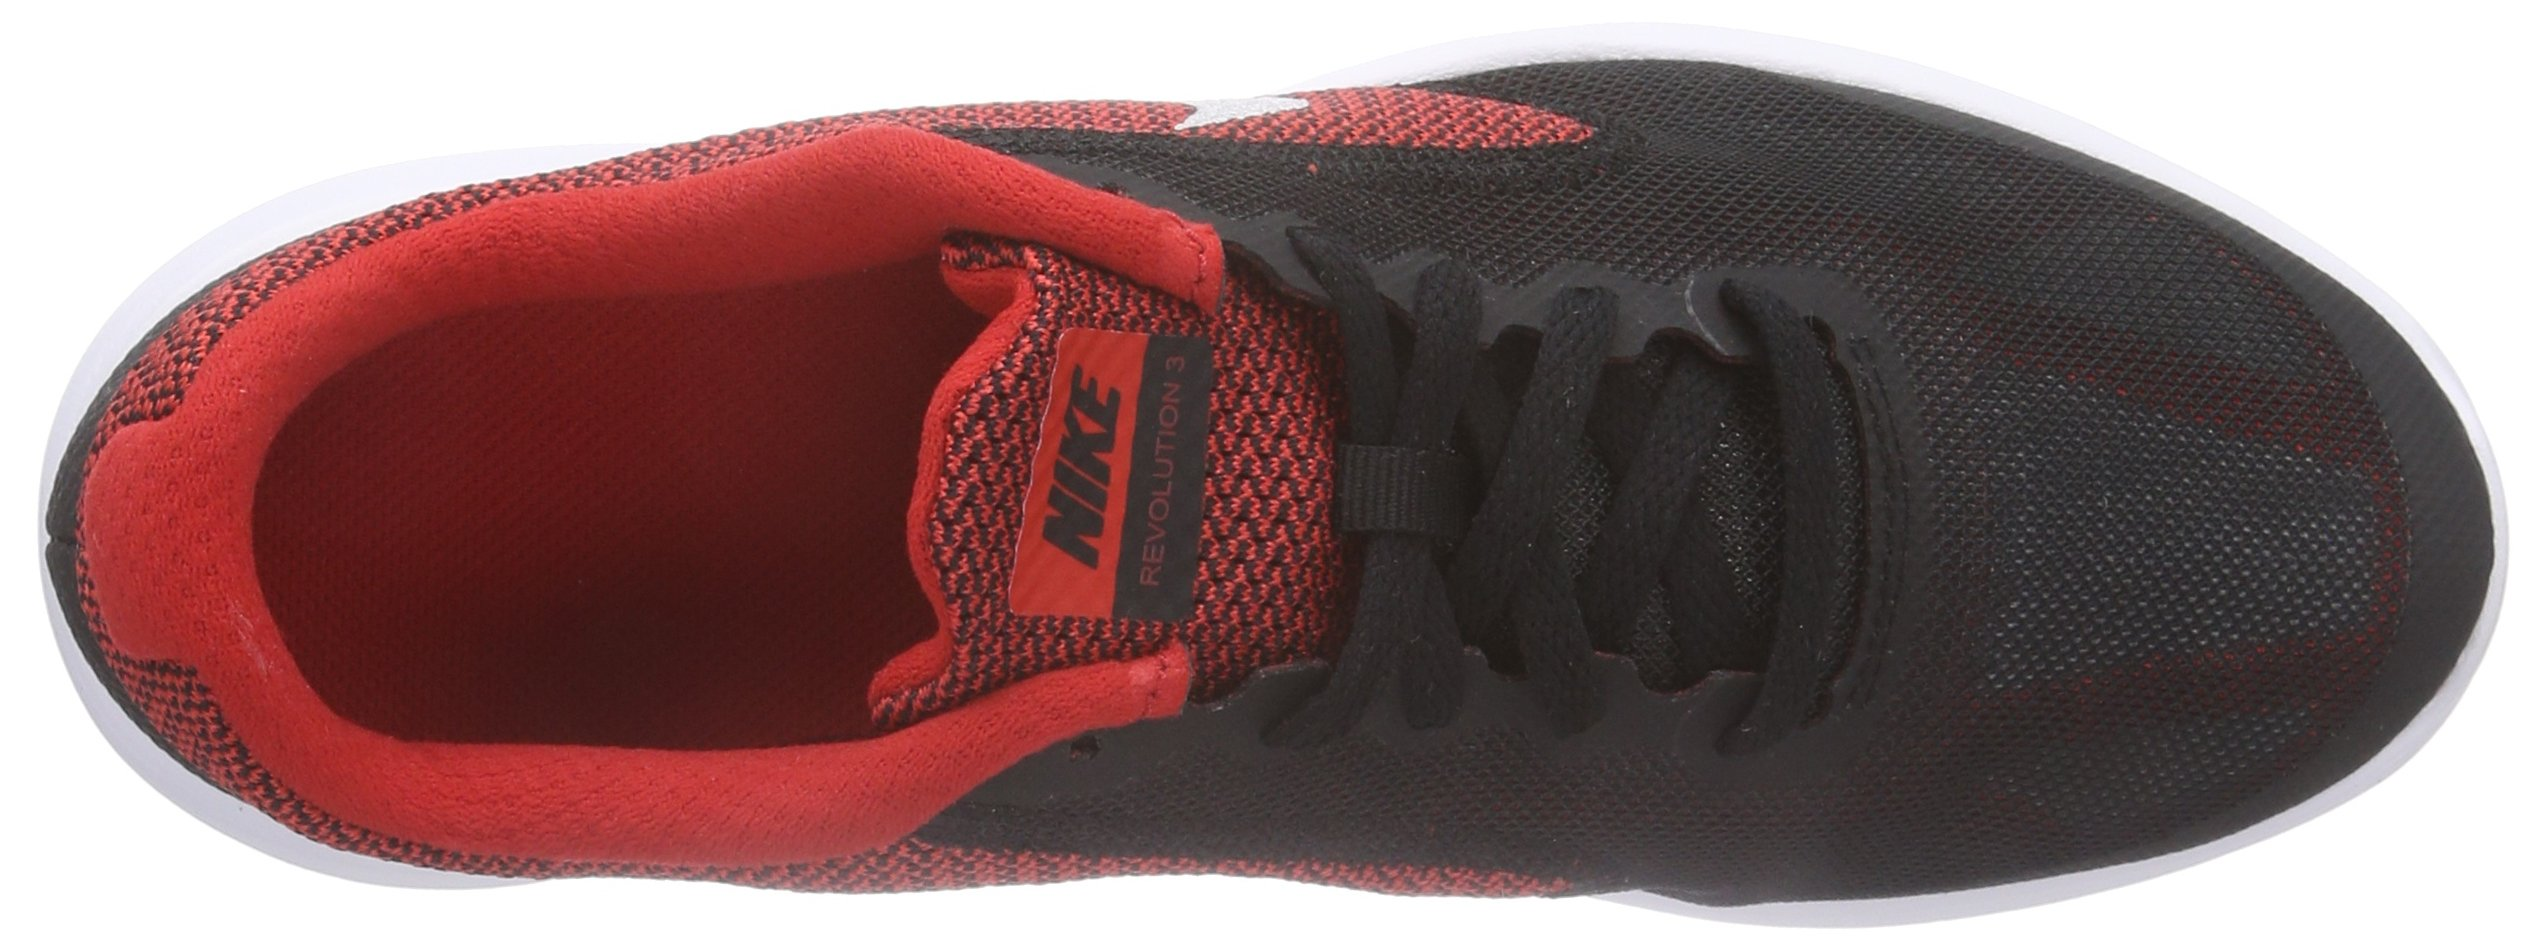 NIKE Boys' Revolution 3 Running Shoe (GS), University Red/Metallic Silver/Black, 4 M US Big Kid by Nike (Image #7)